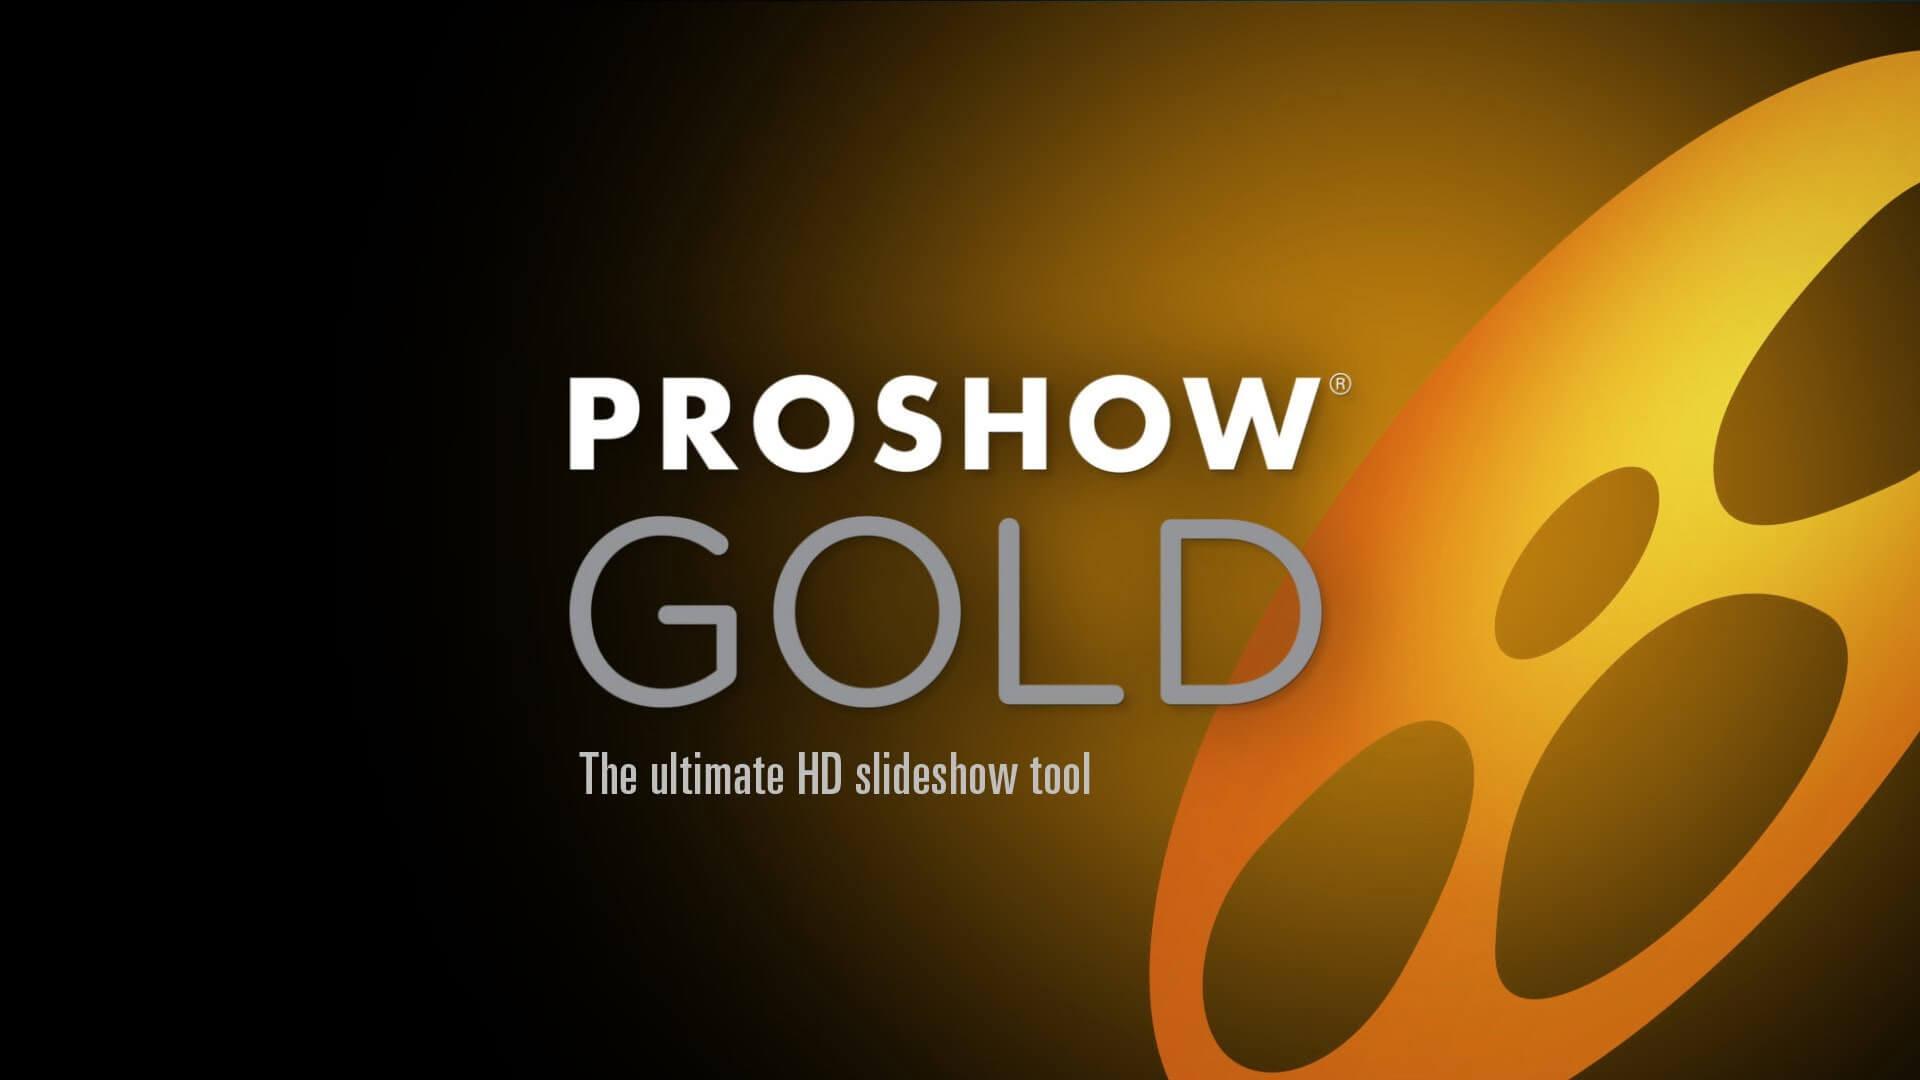 proshow gold pro 2020 crack